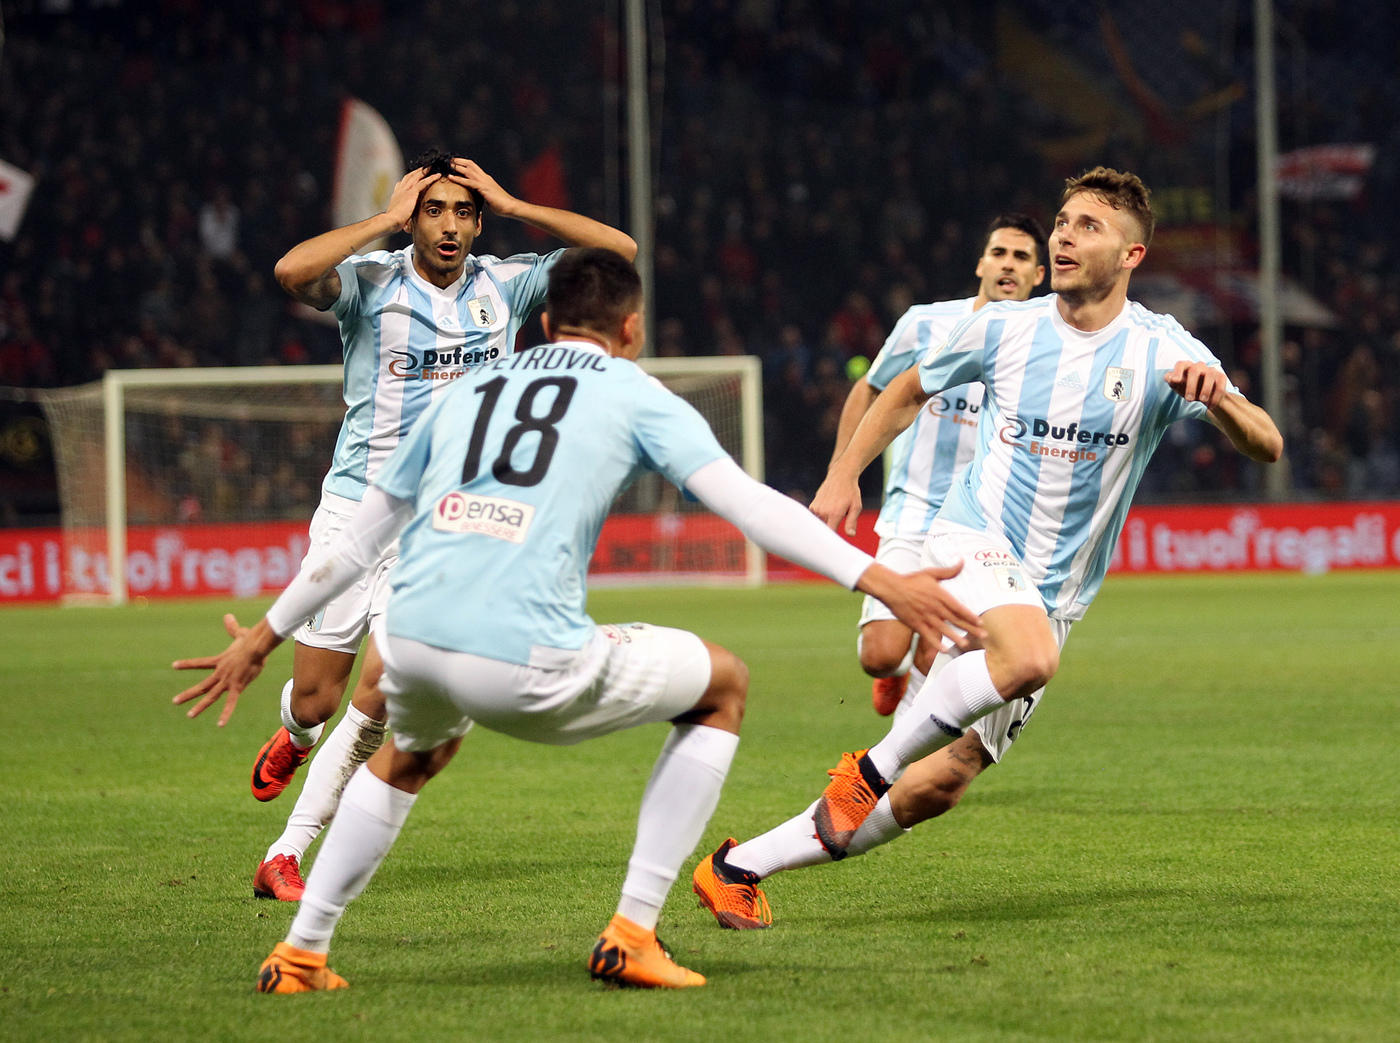 Coppa Italia, favola Entella